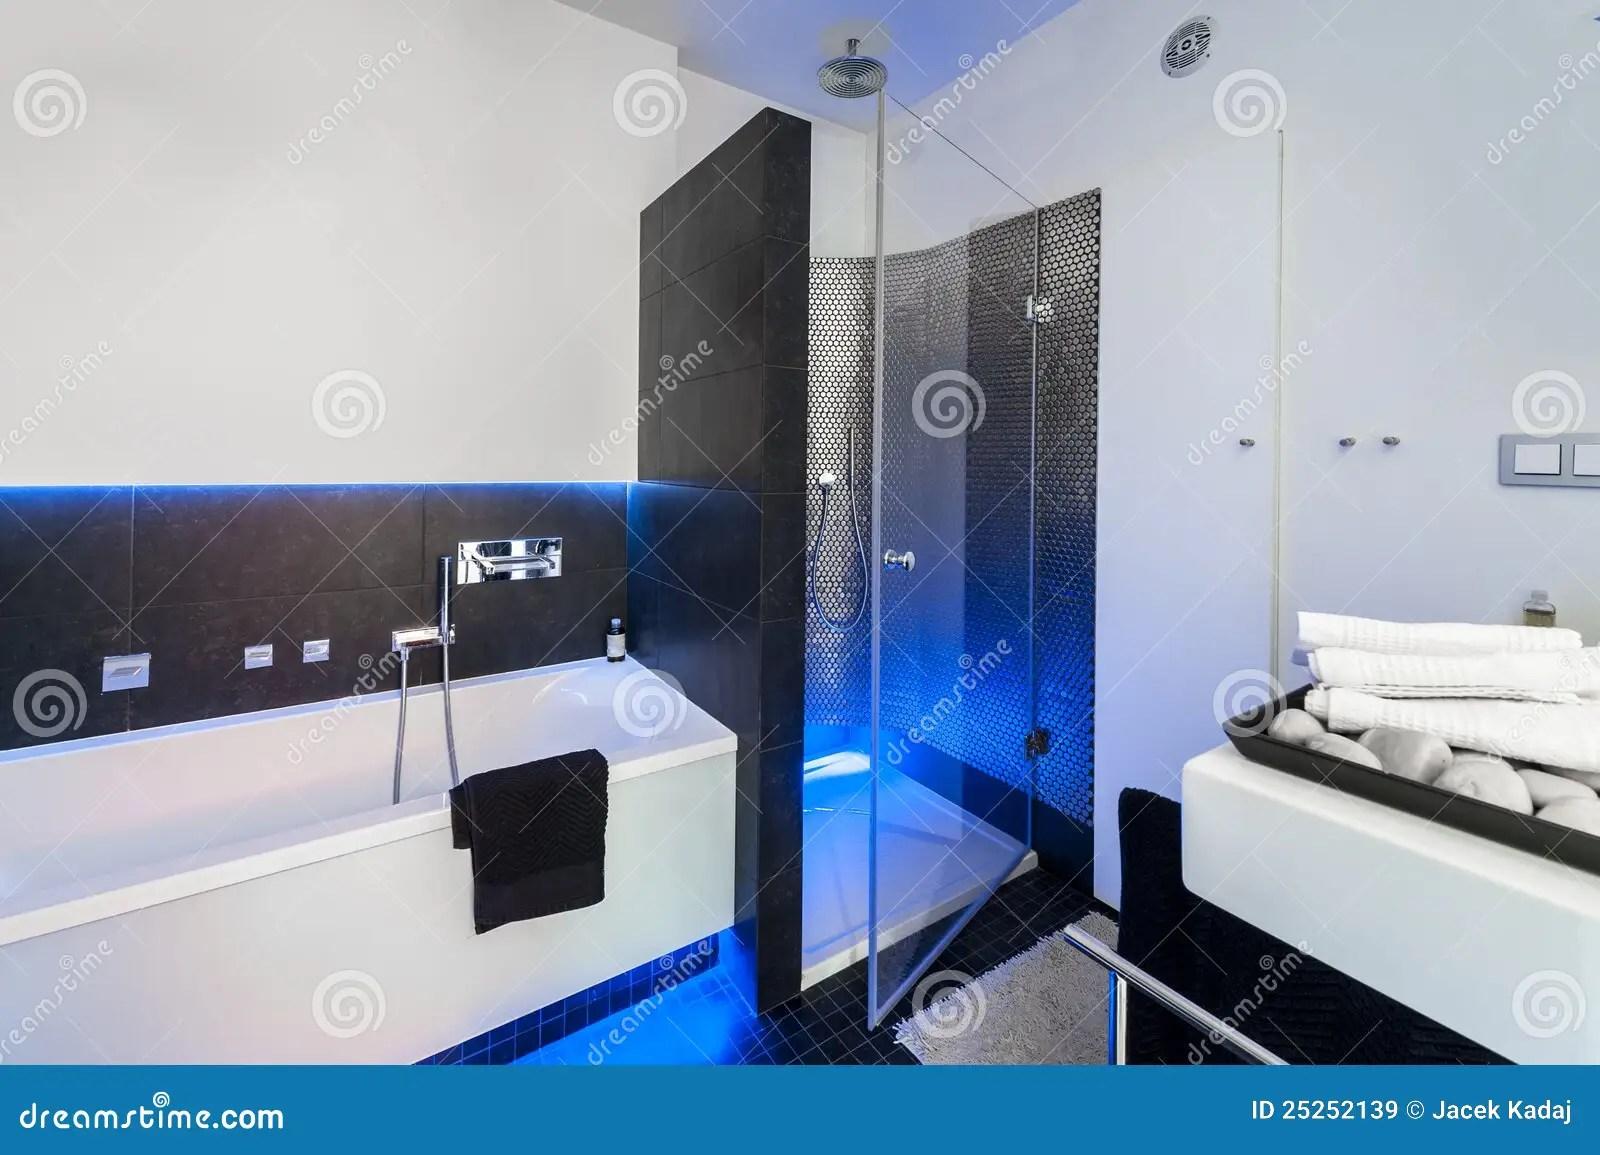 conception salle de bain 3d free download image with conception salle de bain 3d cheap ikea. Black Bedroom Furniture Sets. Home Design Ideas